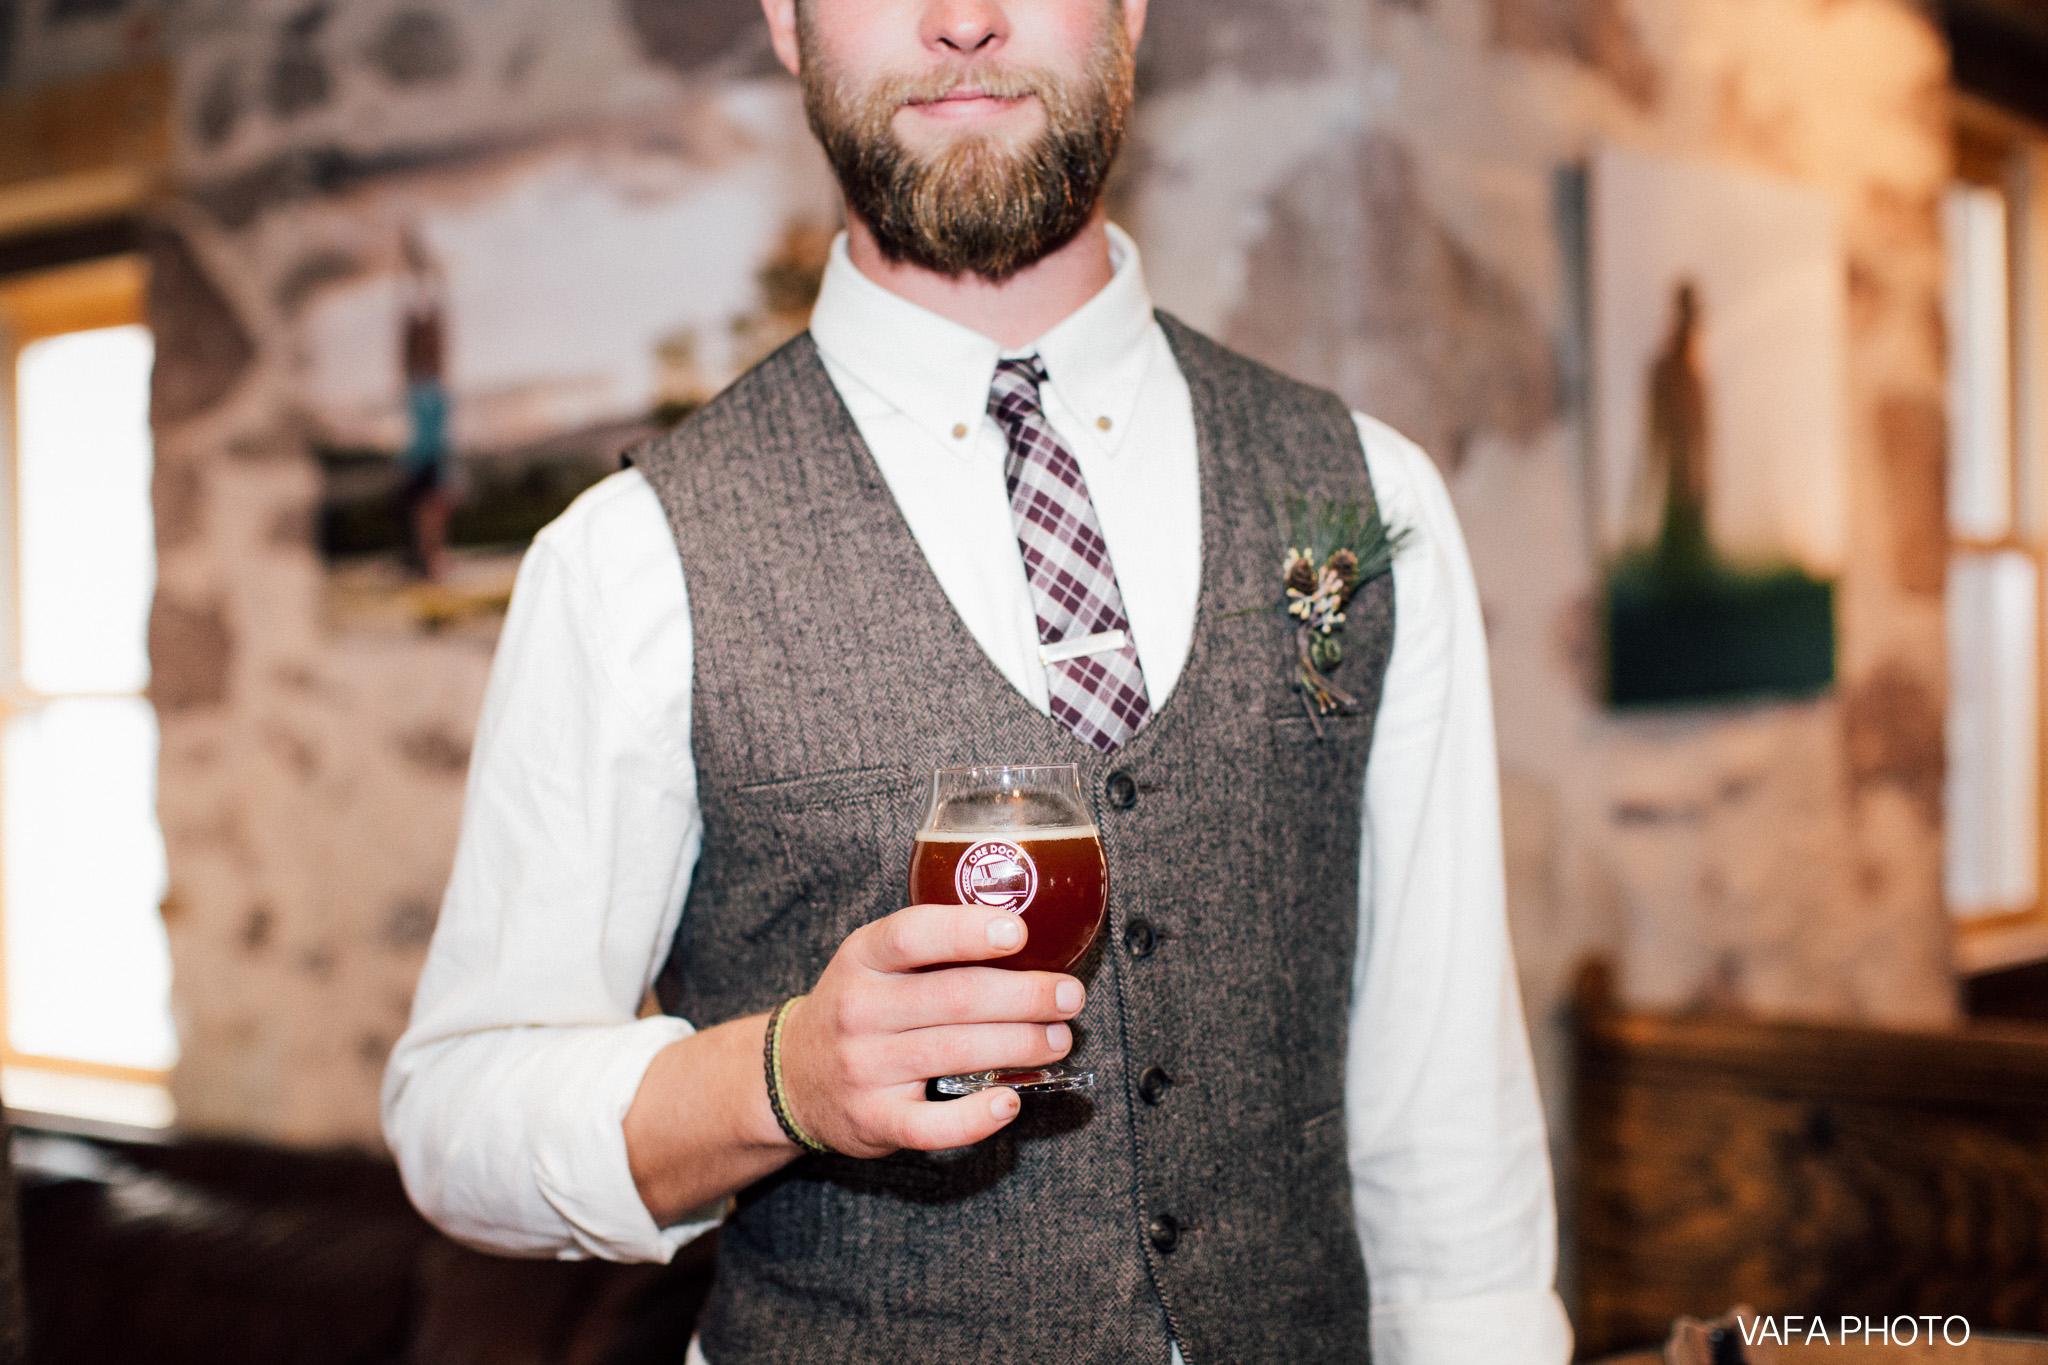 Hogback-Mountain-Wedding-Chelsea-Josh-Vafa-Photo-855.jpg